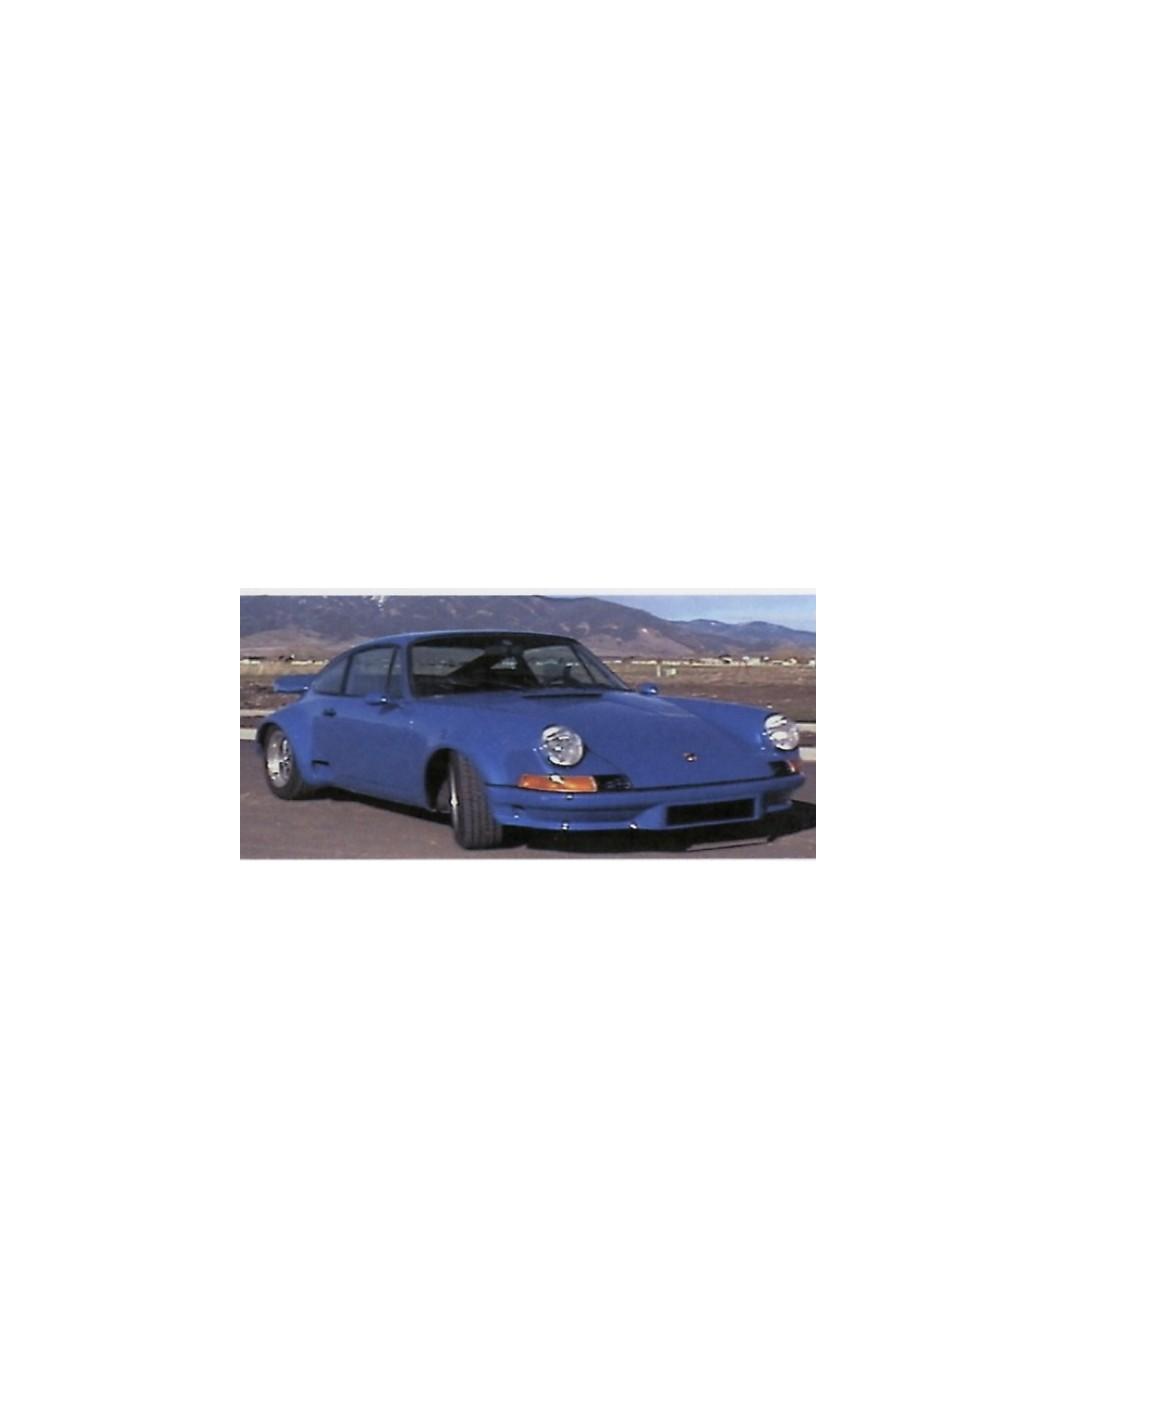 Audi's Nagarro blue with